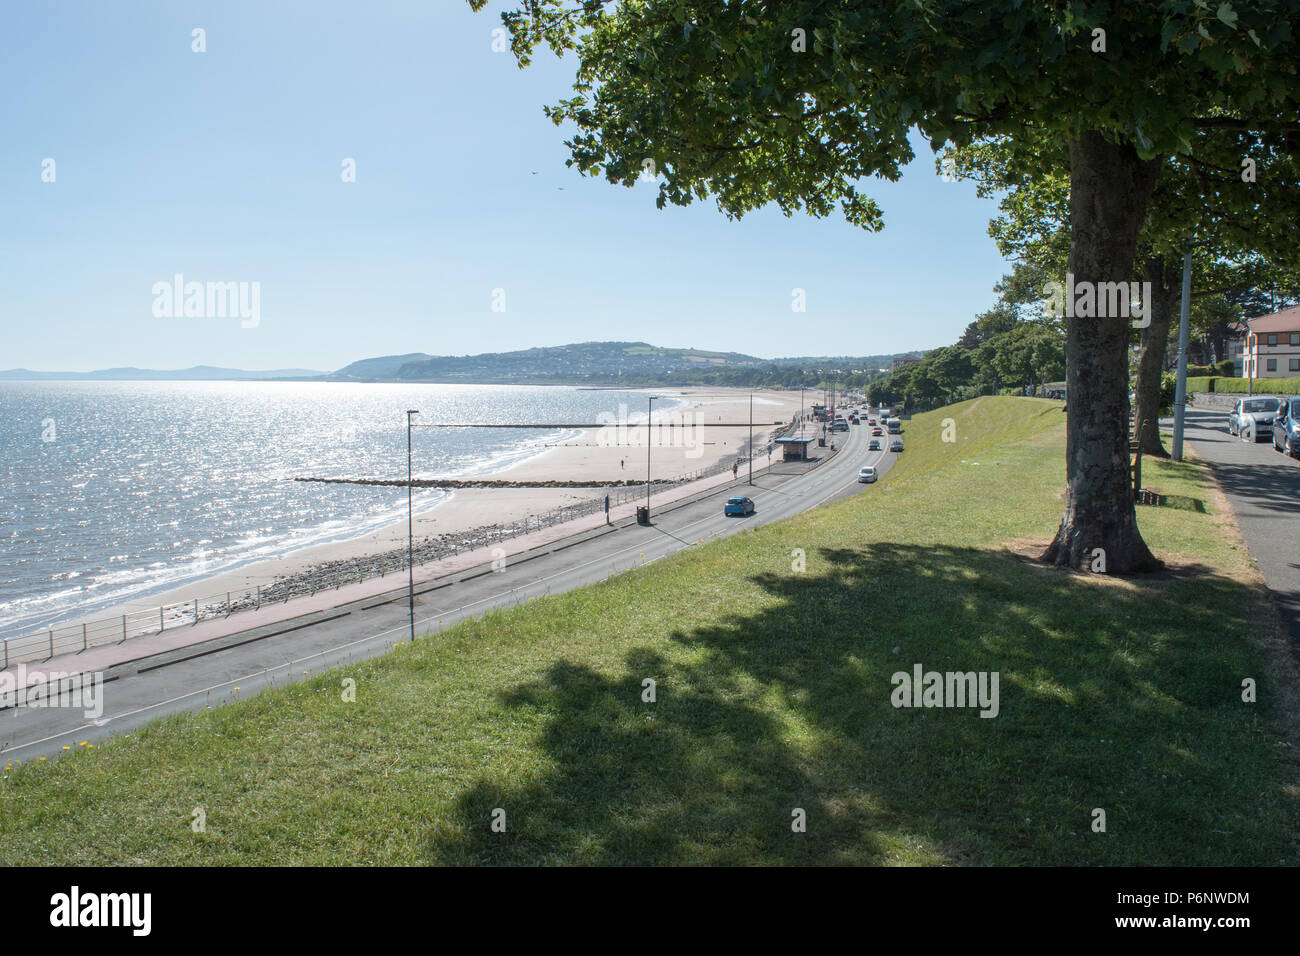 Colwyn Bay beach and promenade - Stock Image